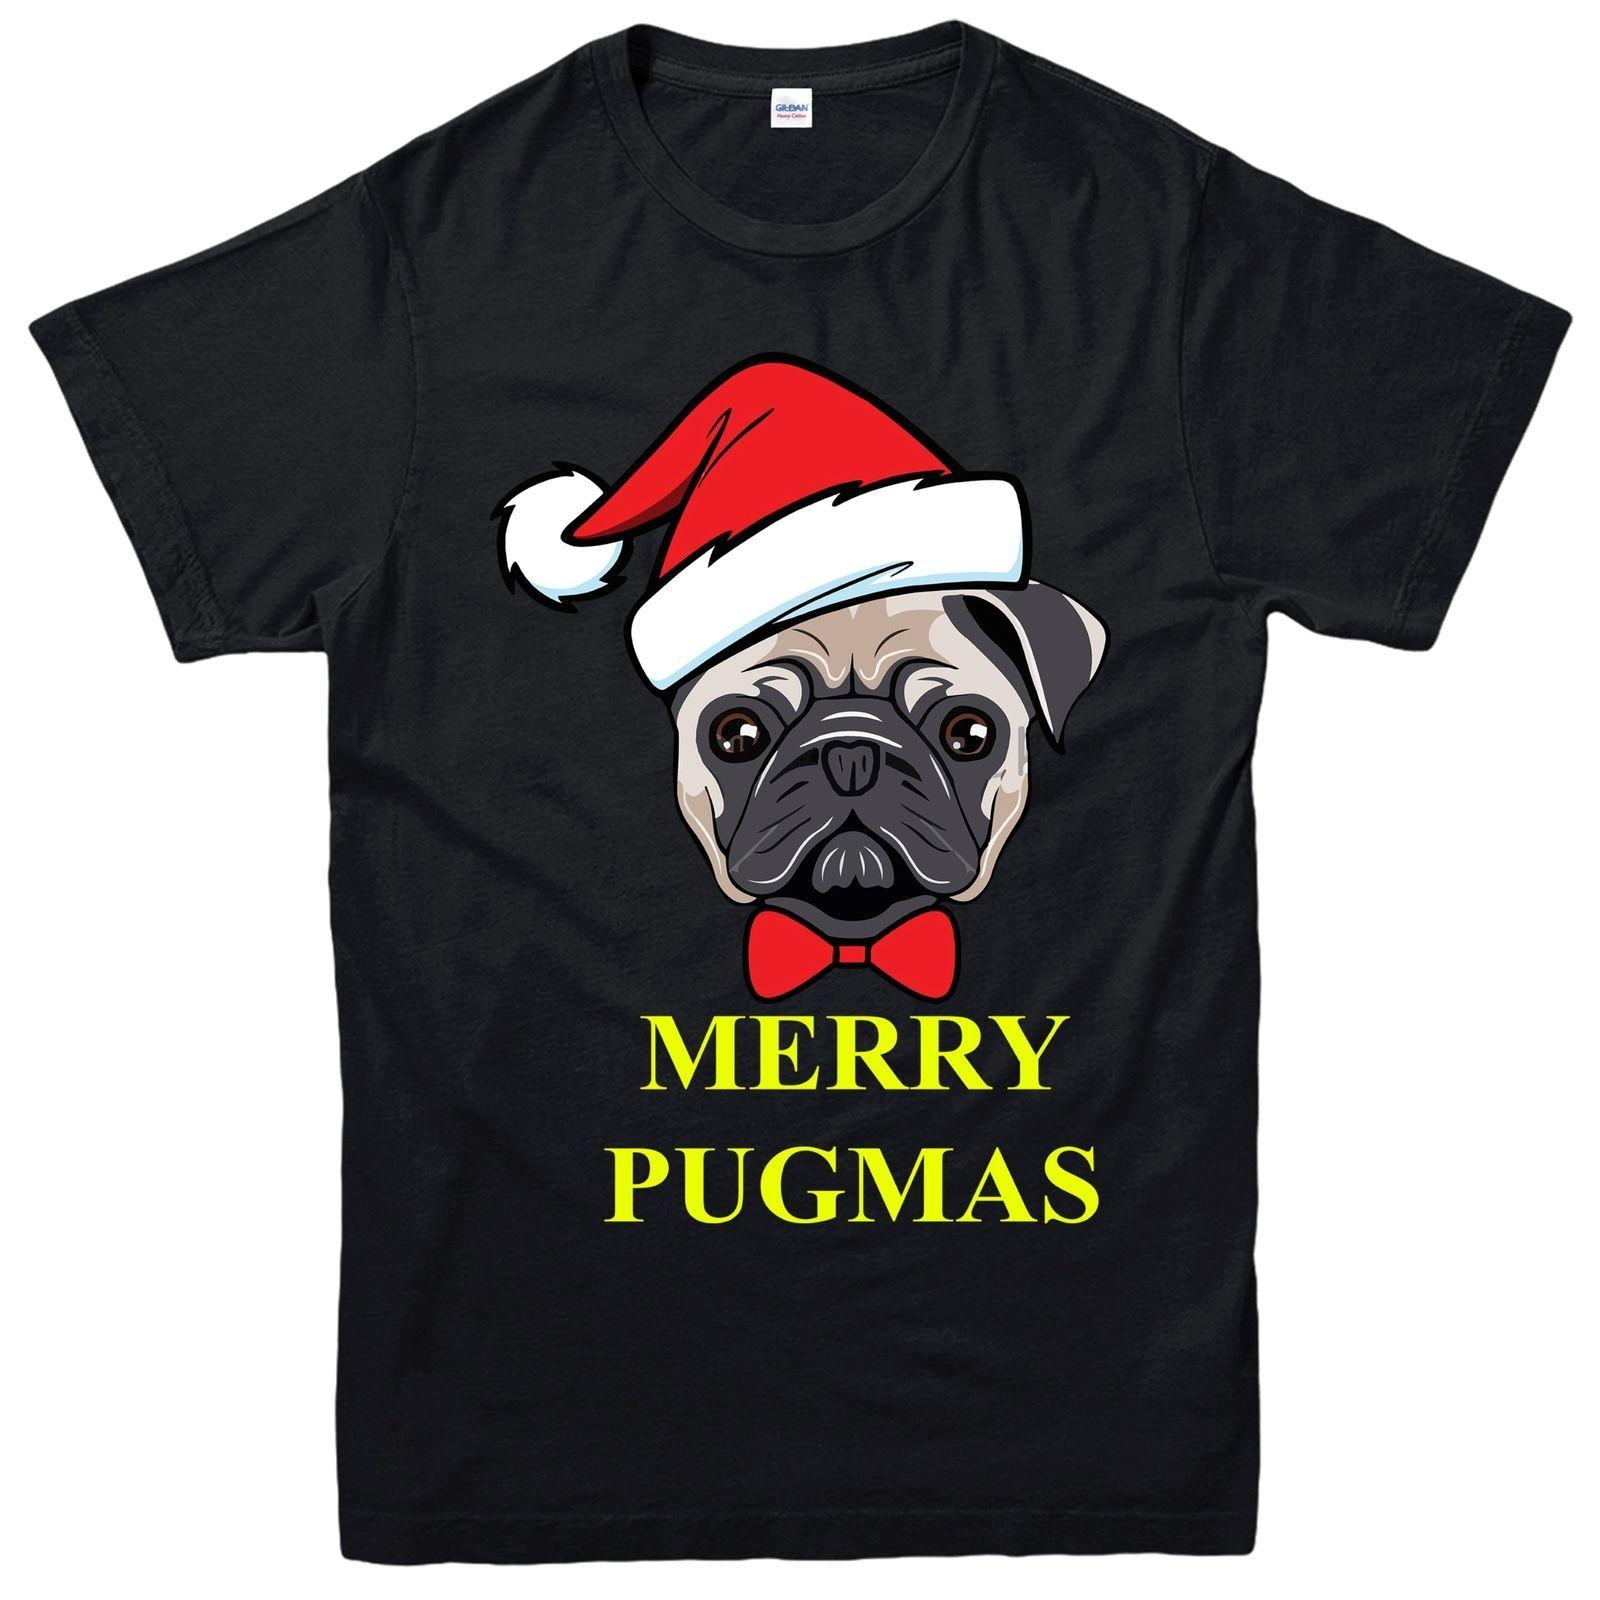 d9e6fac1 Pug Christmas T Shirt, Merry Pugmas Funny Xmas Festive Adult & Kids Tee Top  Funky T Shirts Online Shirts Mens From Kyngbee, $10.72| DHgate.Com